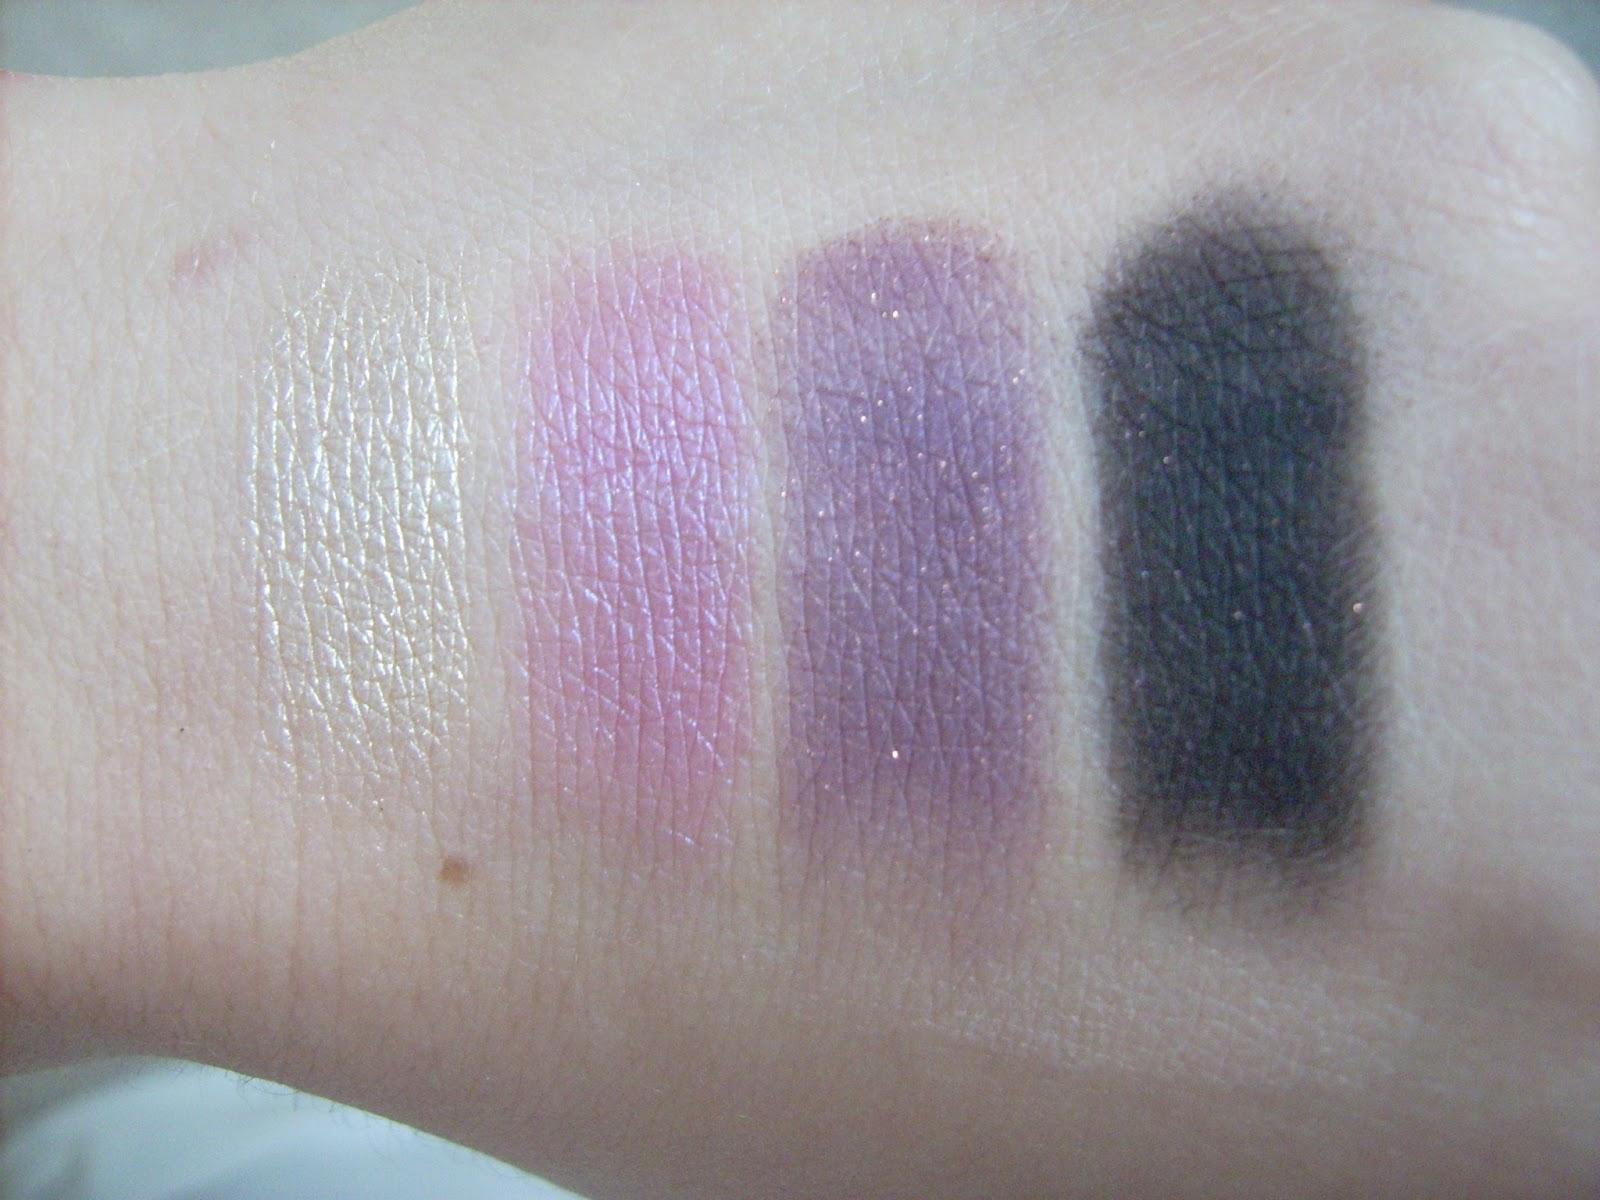 MAC eyeshadows swatch Nylon, Stars 'n' rockets, Trax, Beauty marked